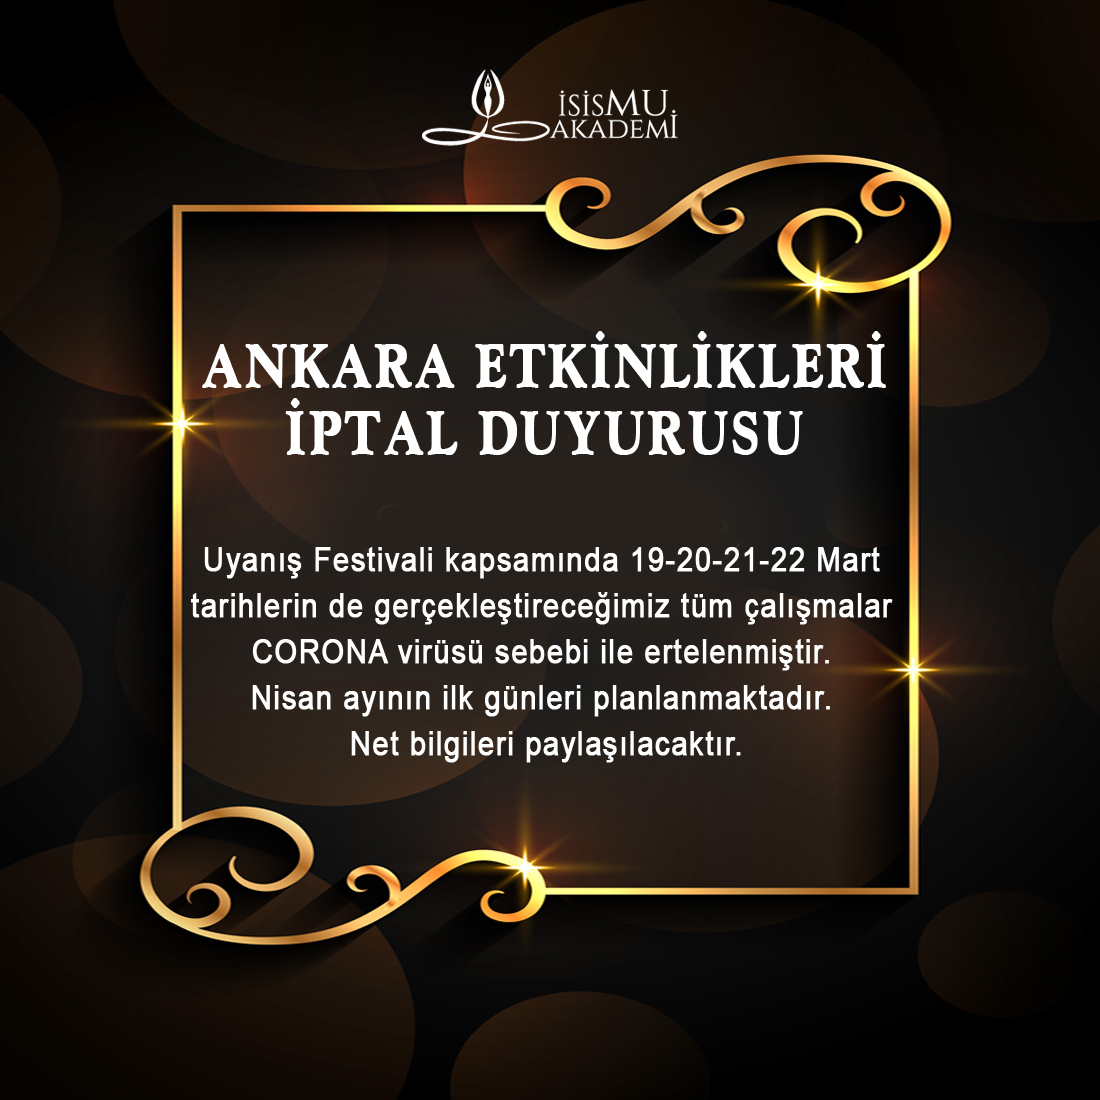 Ankara Etkinlikleri İPTALİ 19-20-21-22 Mart 2020